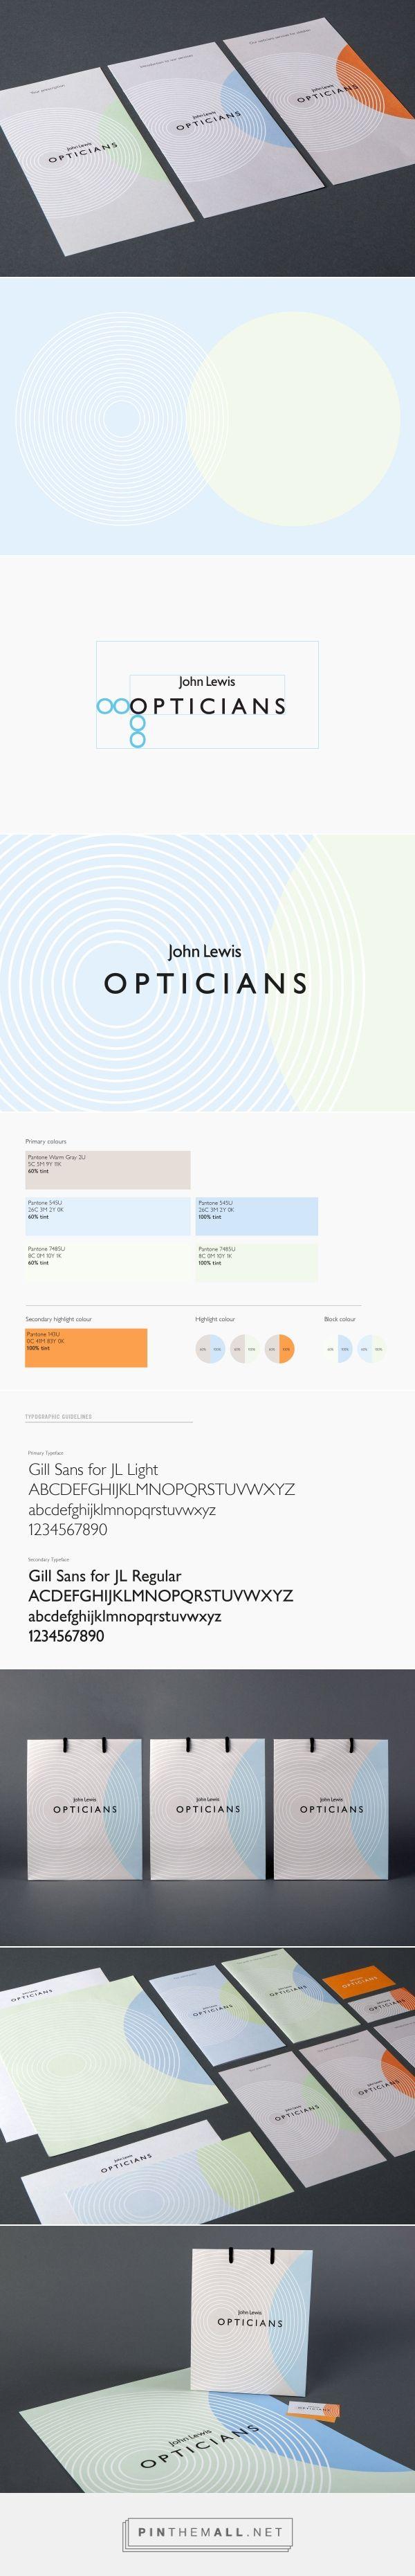 john lewis opticians identity egelnick and webb created via rh pinterest co uk Brand Standards Manuals Brand Identity Manual